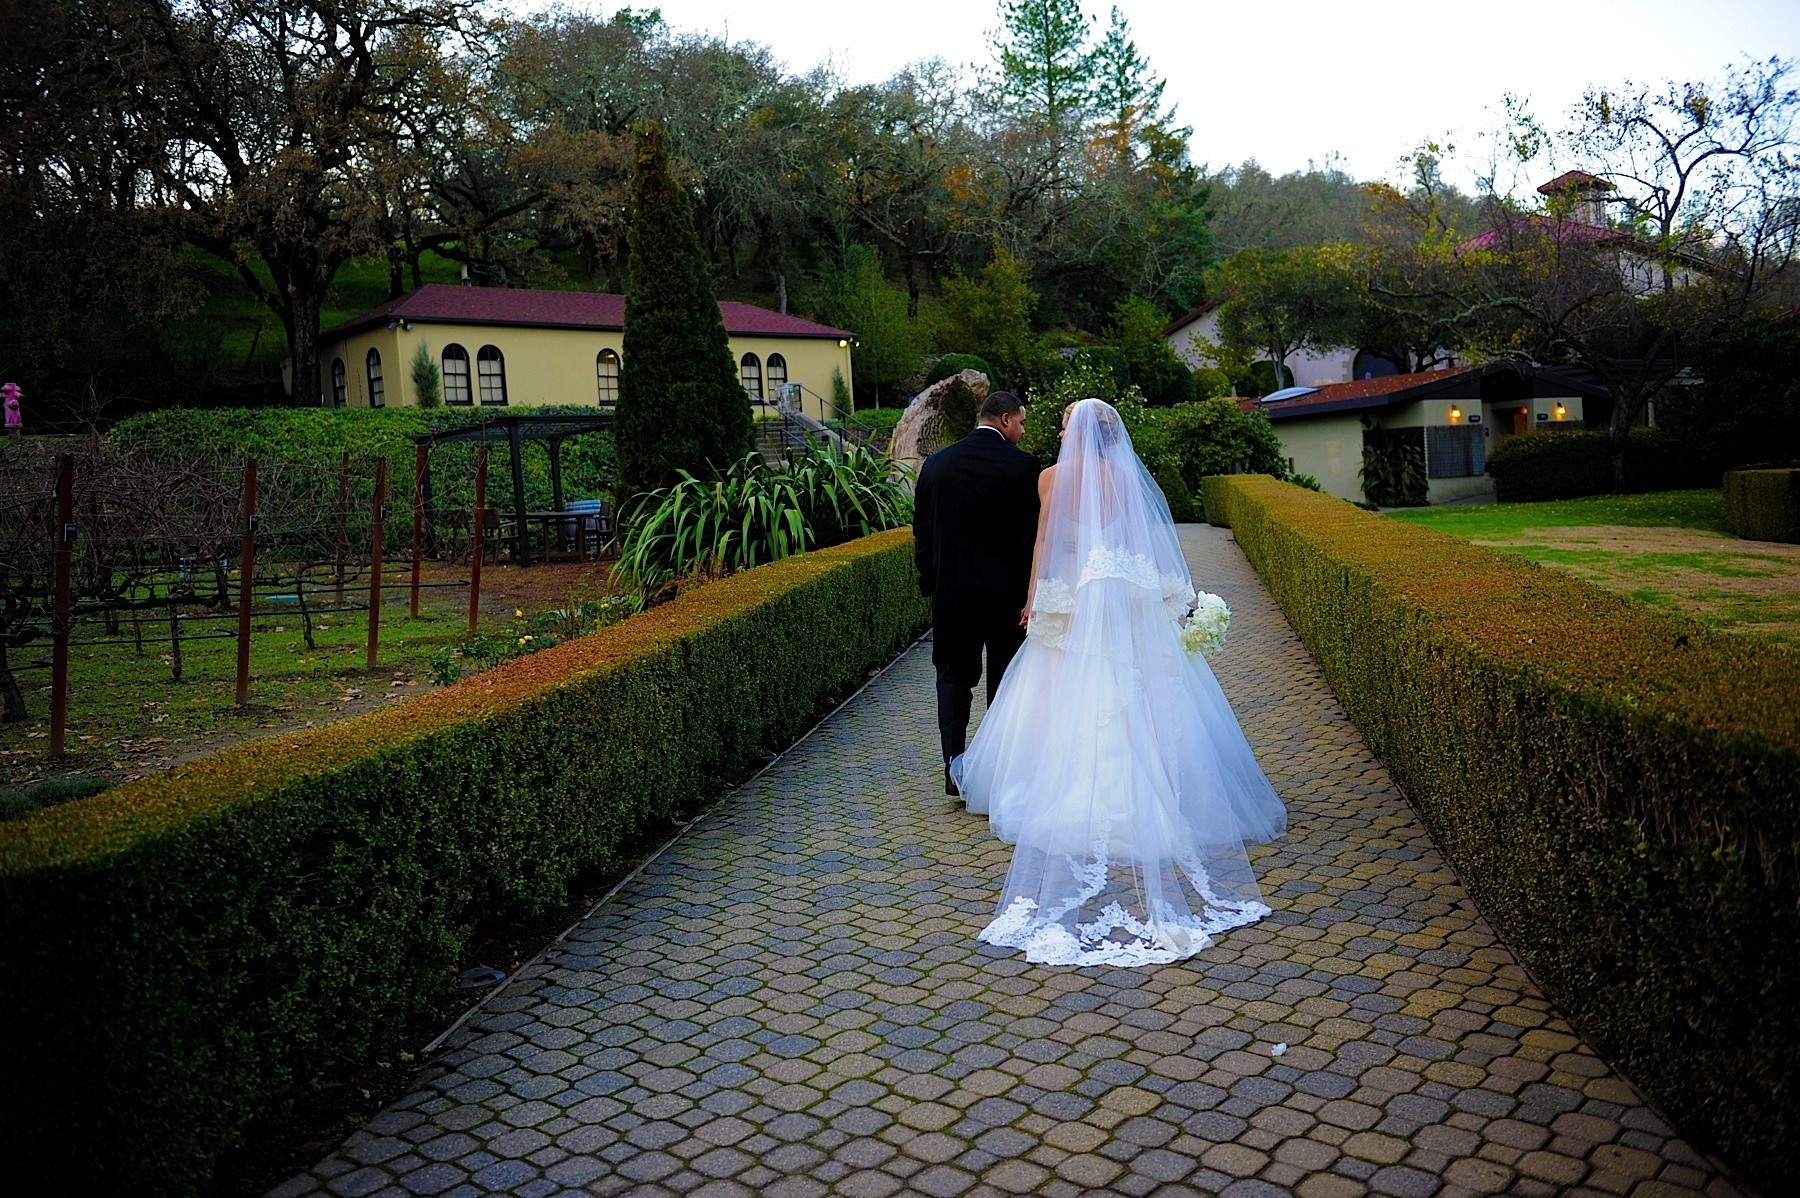 culinary_institute_of_america_napa_valley_wedding_065photographer_